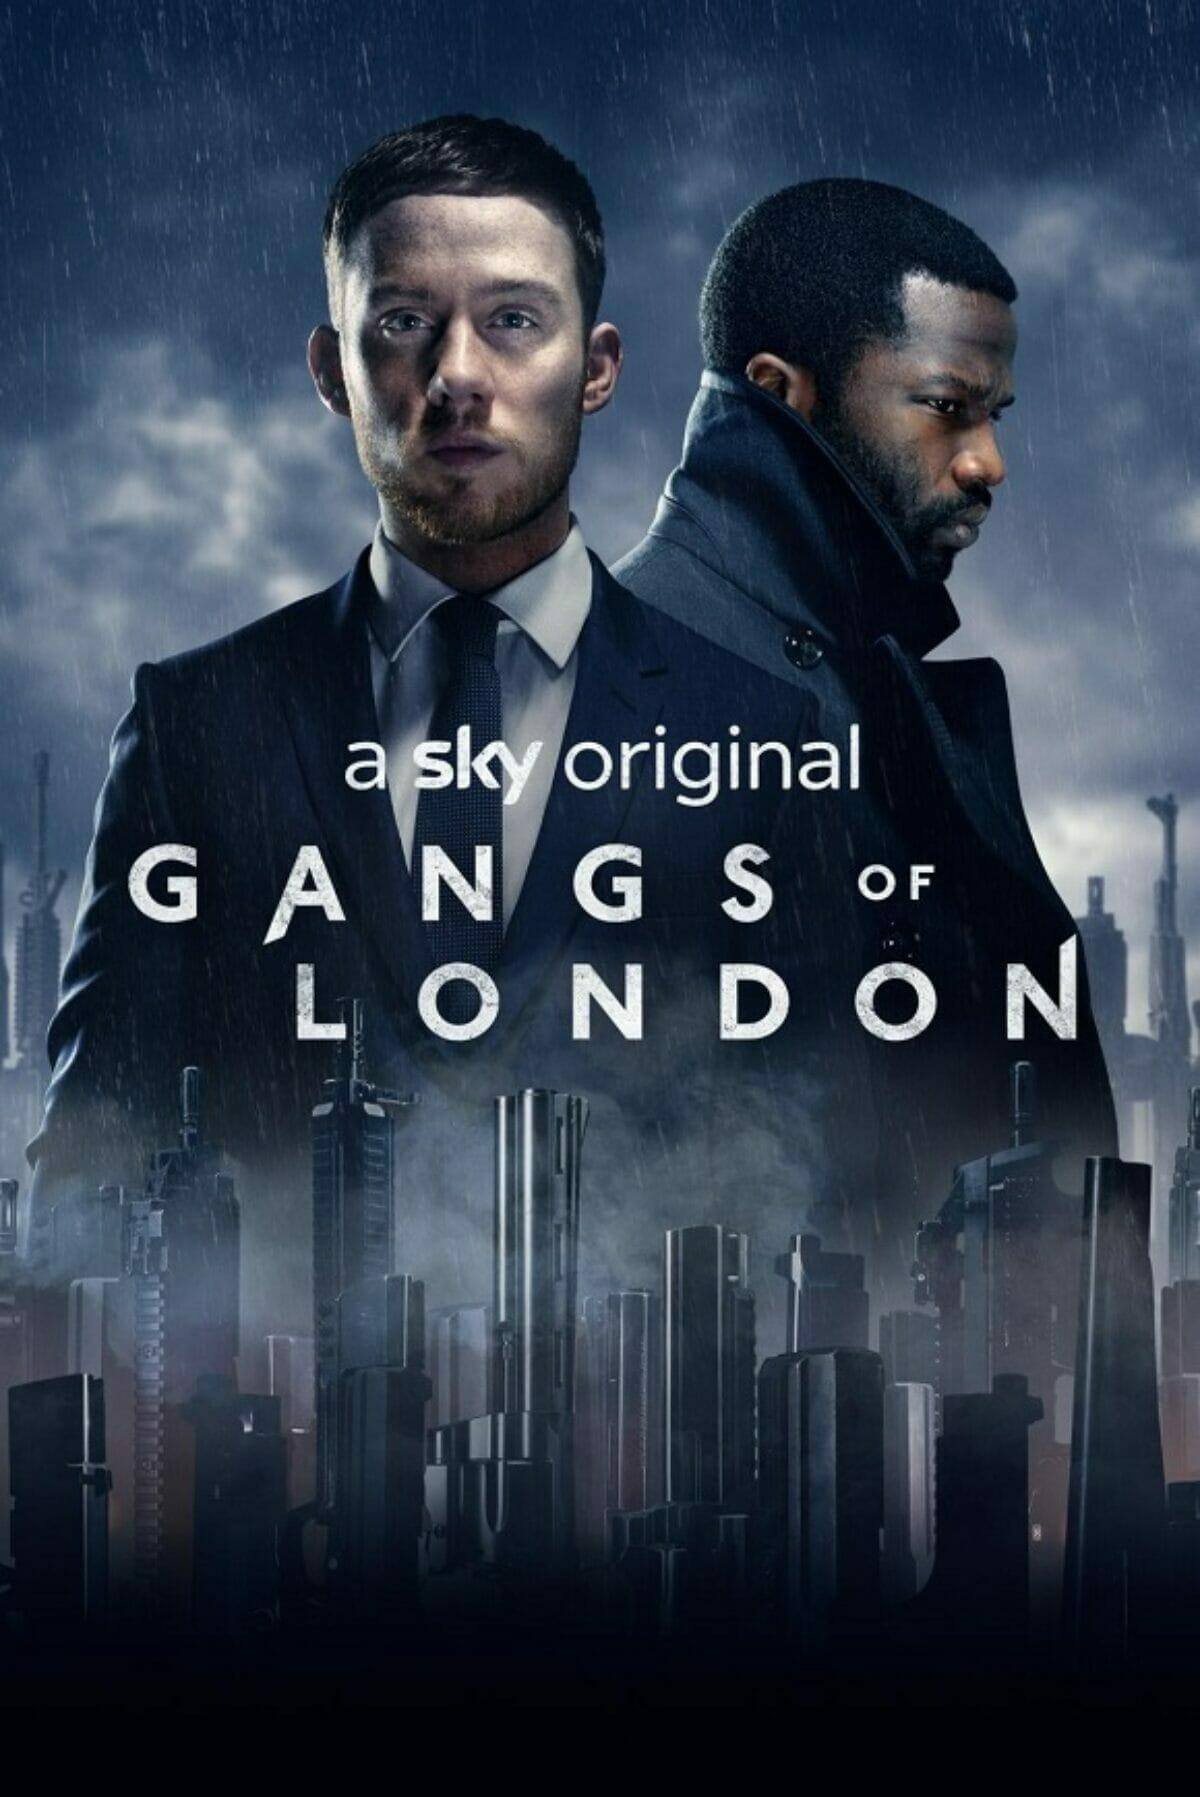 Gangs-of-london-poster-saison1